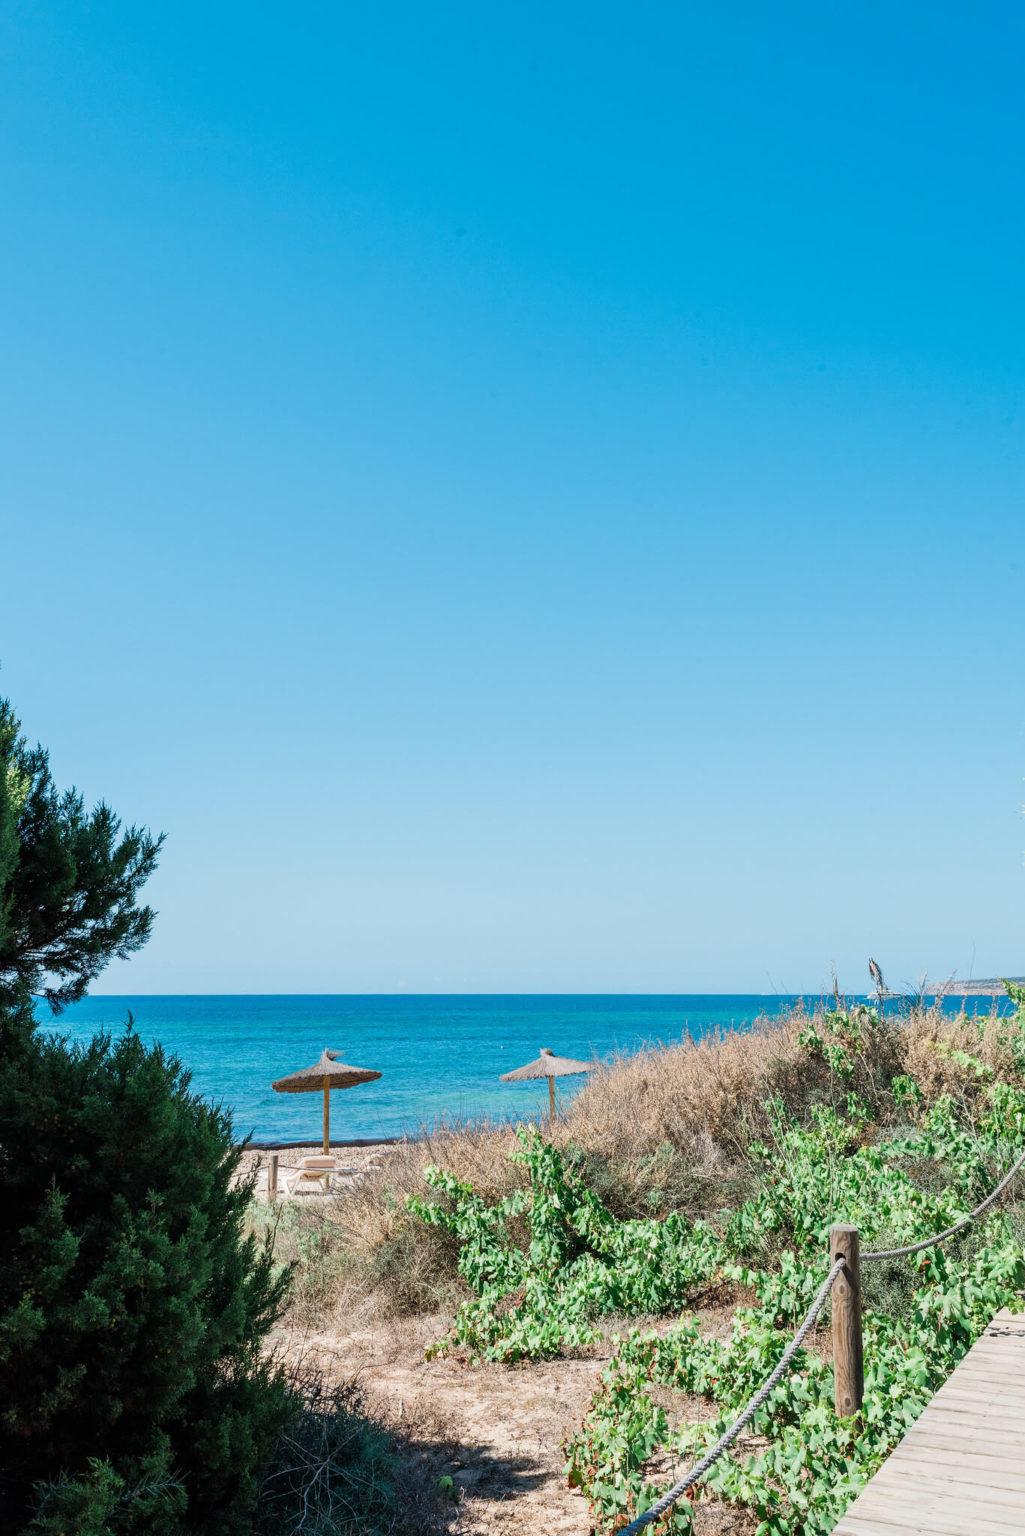 https://www.white-ibiza.com/wp-content/uploads/2020/03/formentera-beaches-migjorn-2020-10-1025x1536.jpg